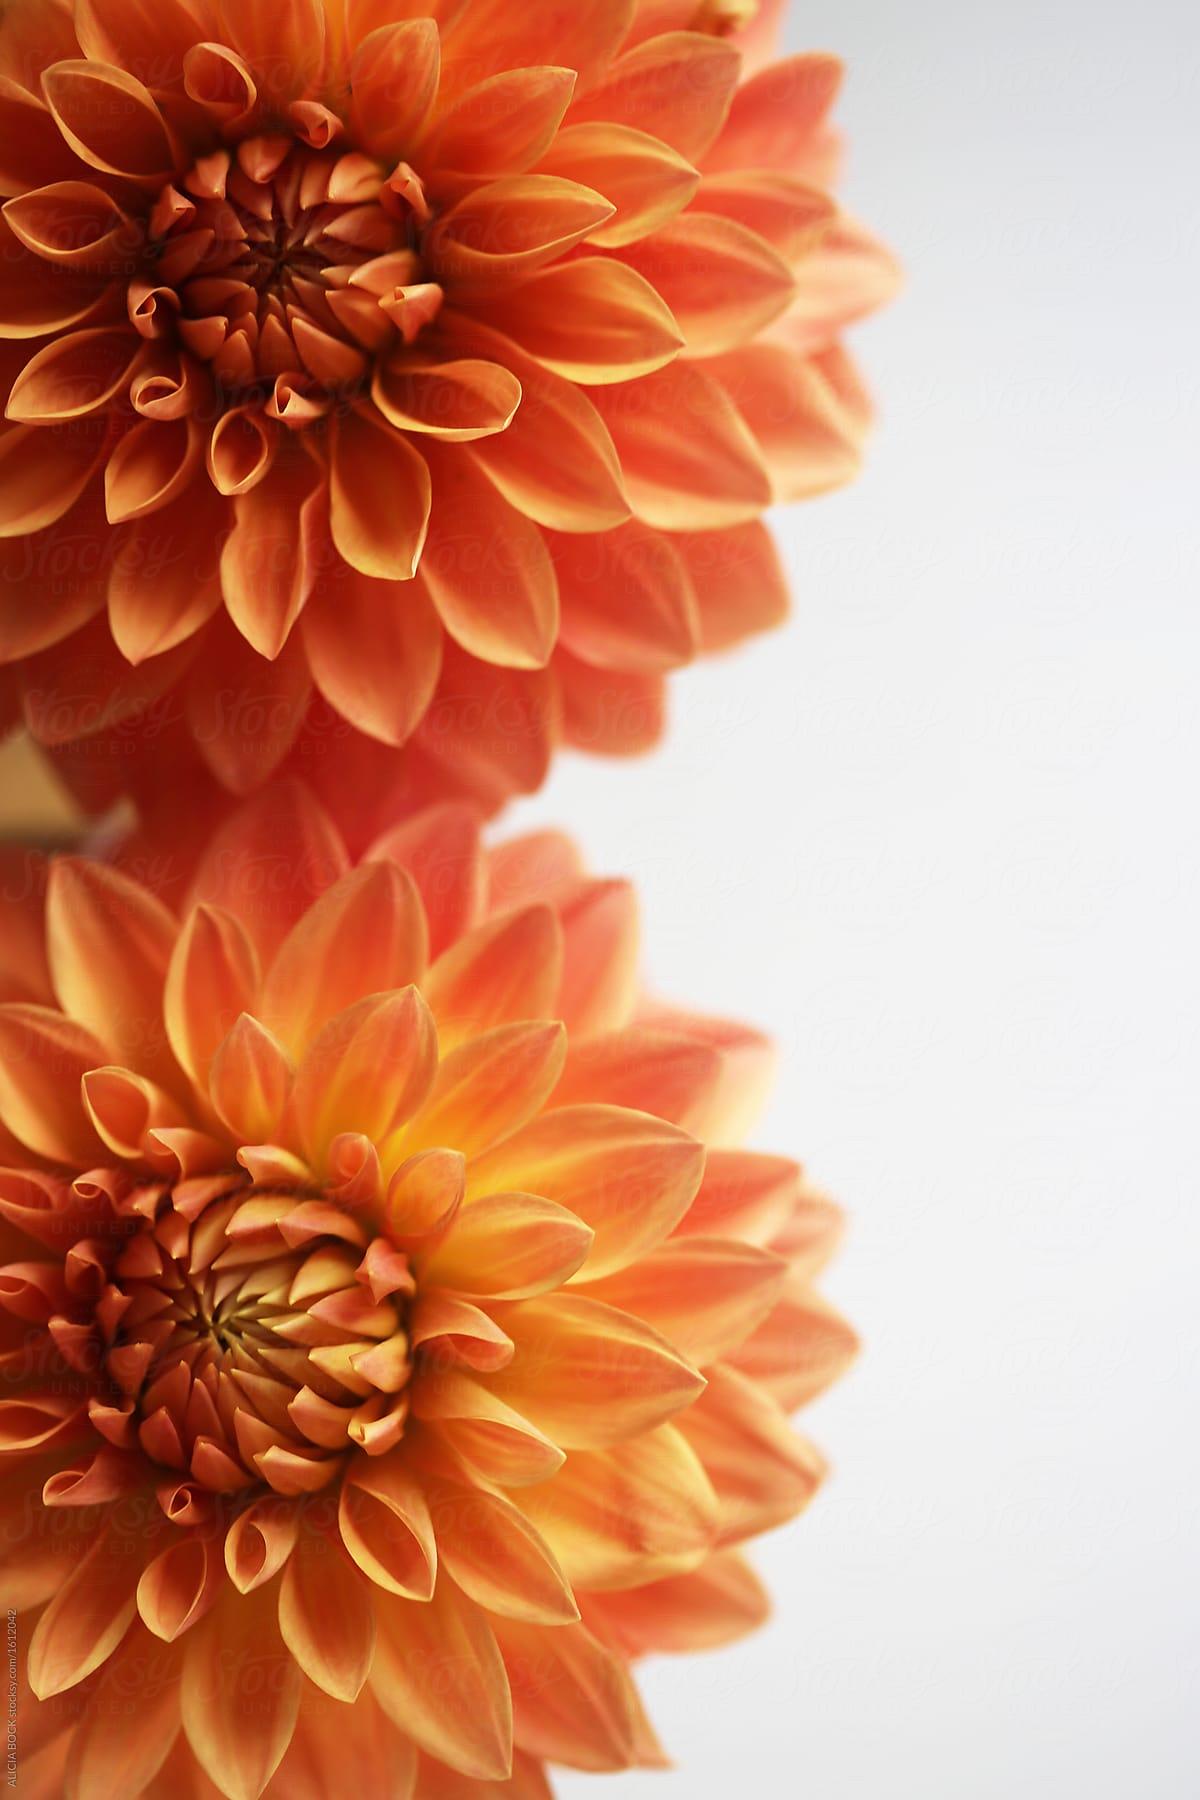 Close Up Of Two Vibrant Orange Dahlia Flowers Stocksy United